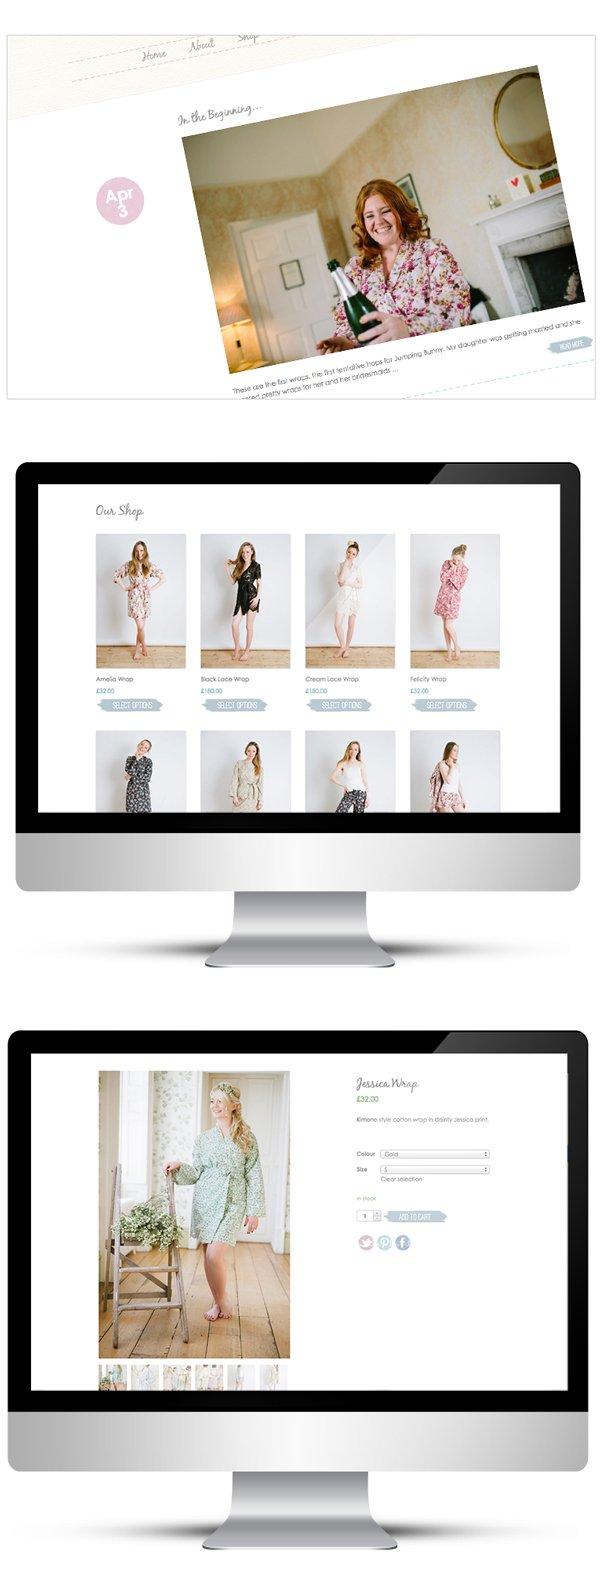 Jumping Bunny Nightwear Online Shop